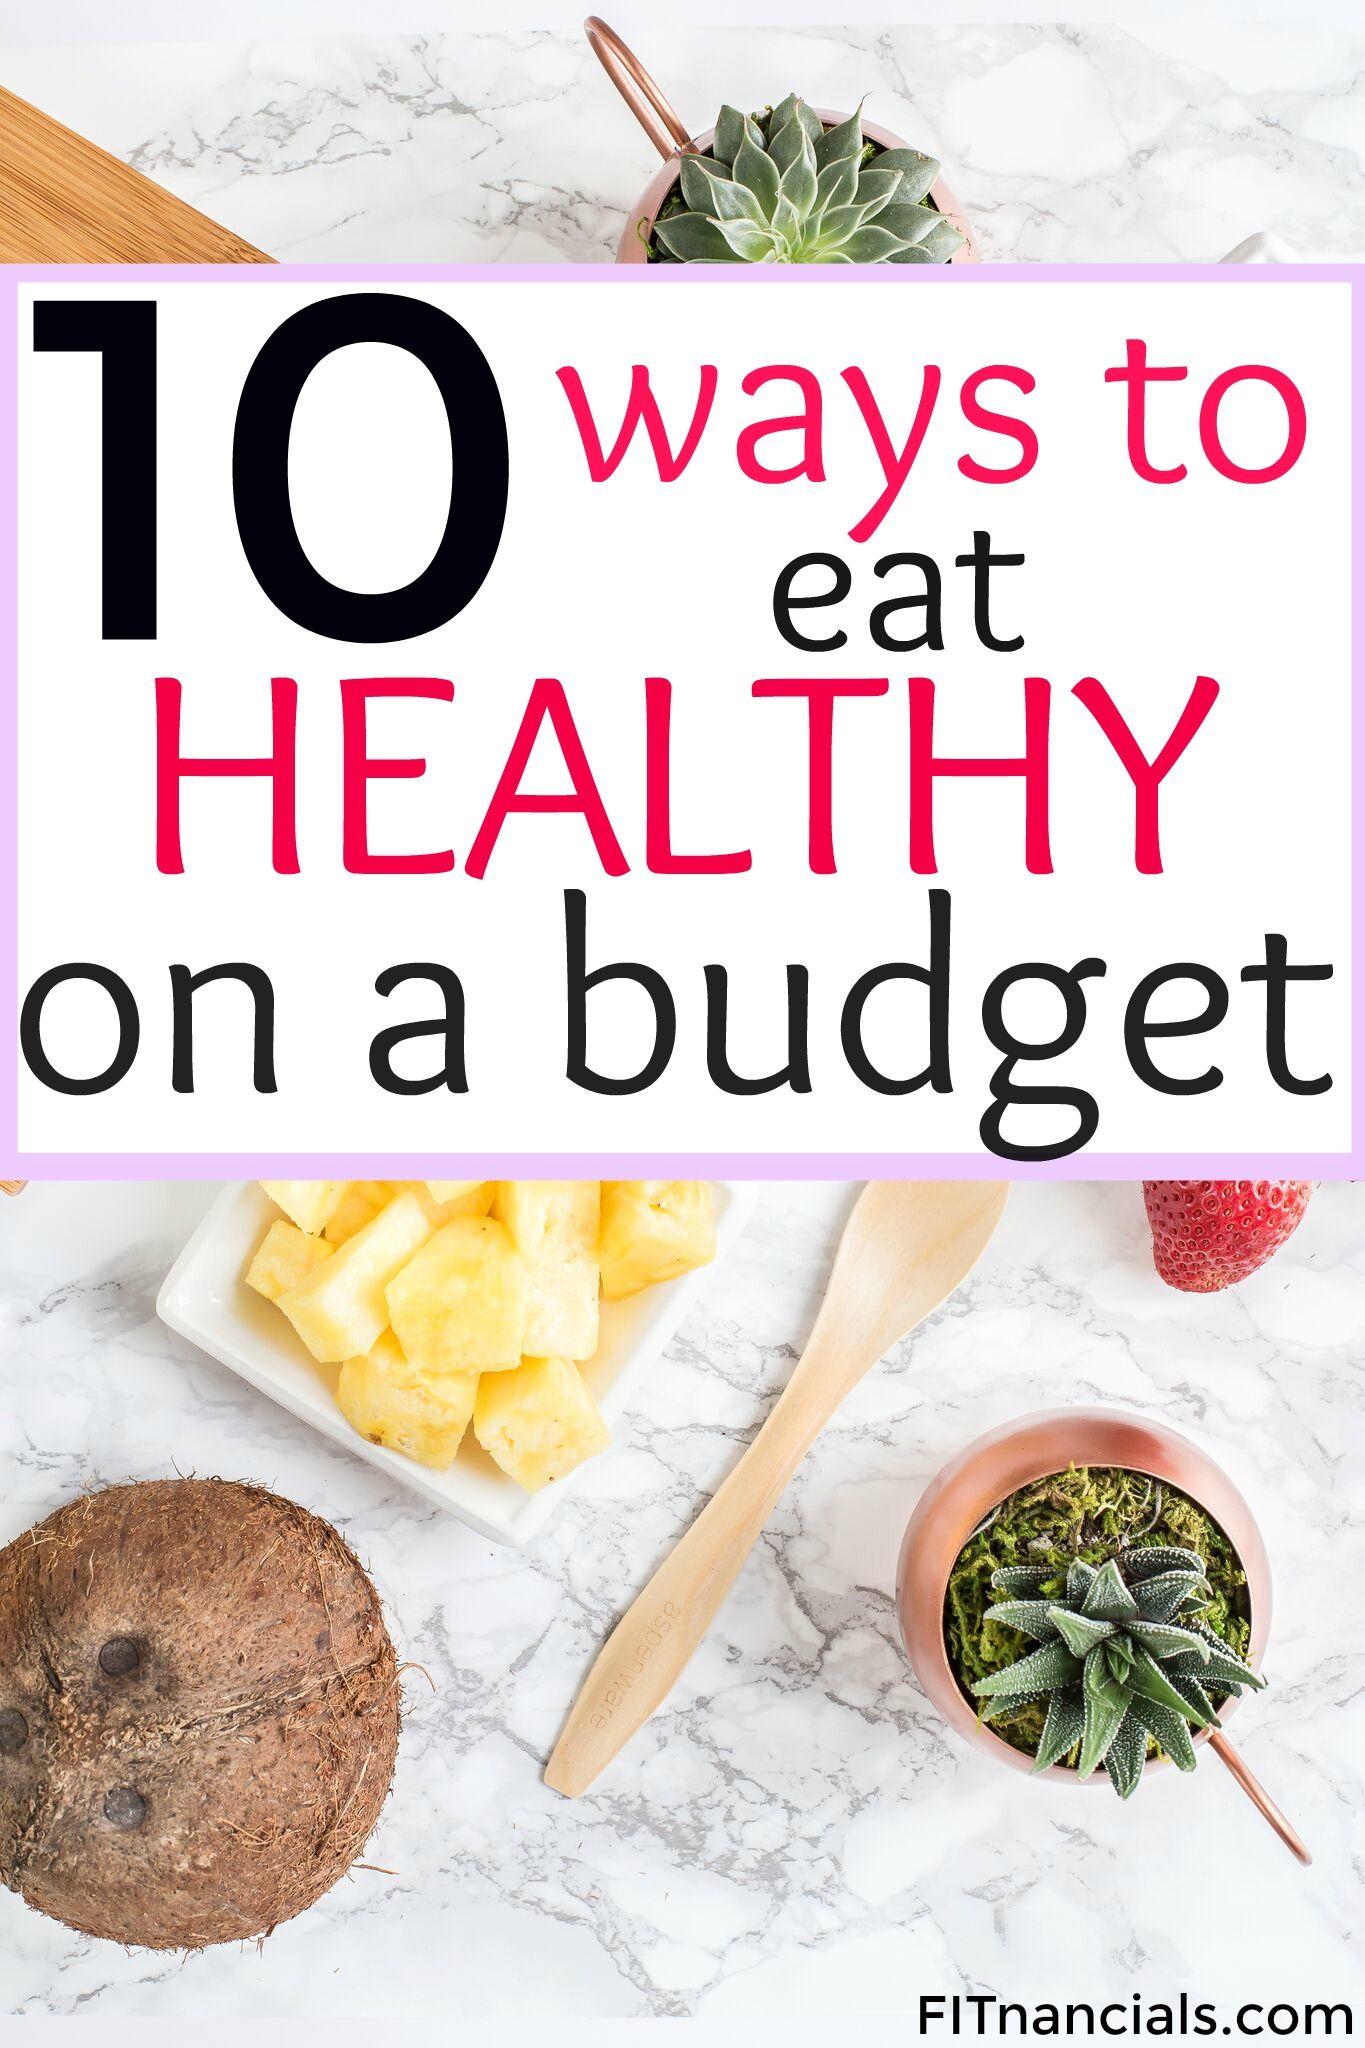 Economical healthy lifestyle 16